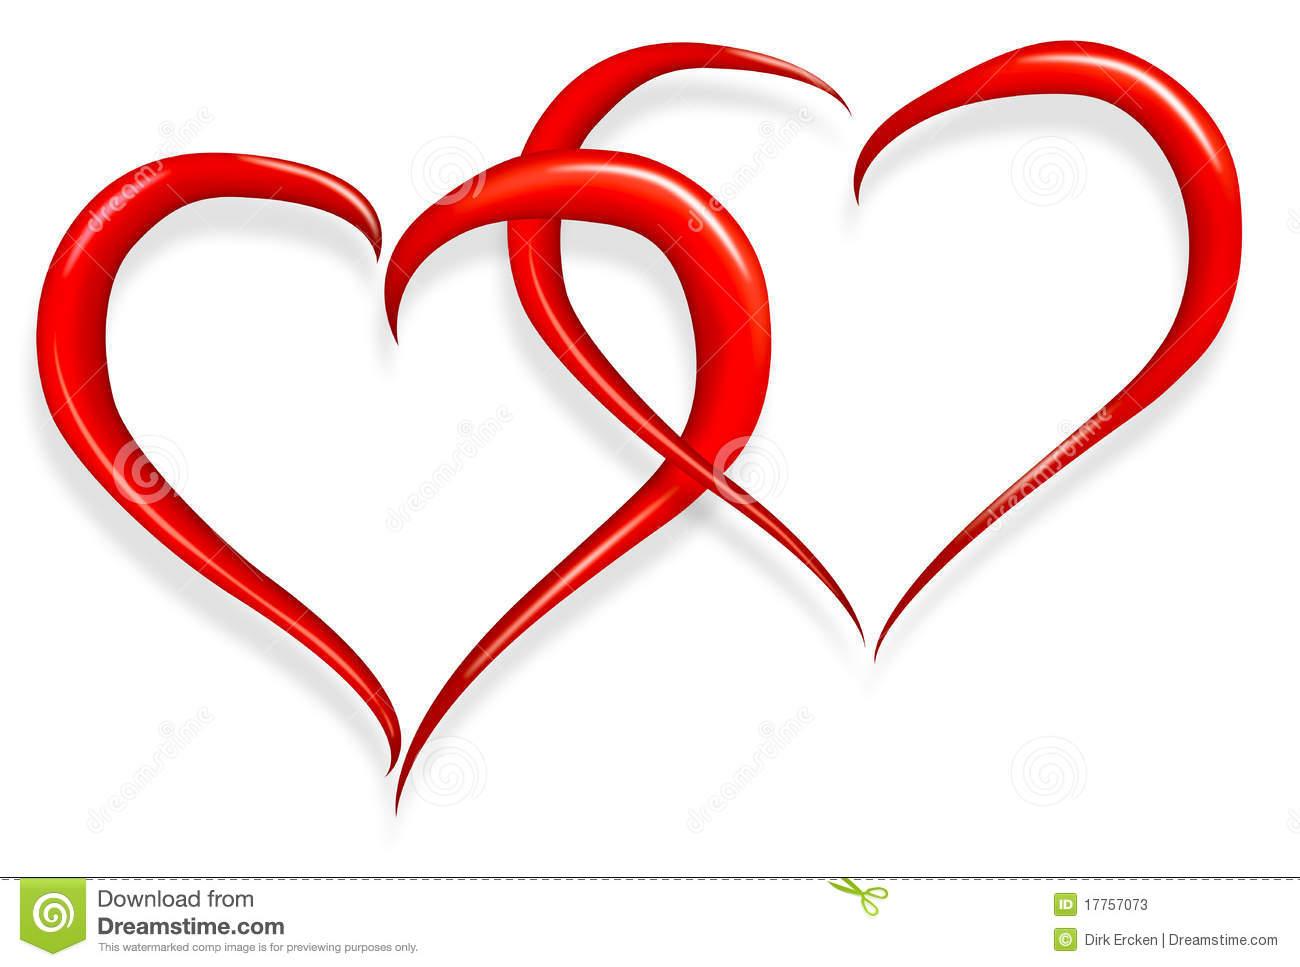 Love hearts happy clipart banner royalty free stock Love Heart Happy Valentines Day Stock Photos - Image: 17757073 banner royalty free stock